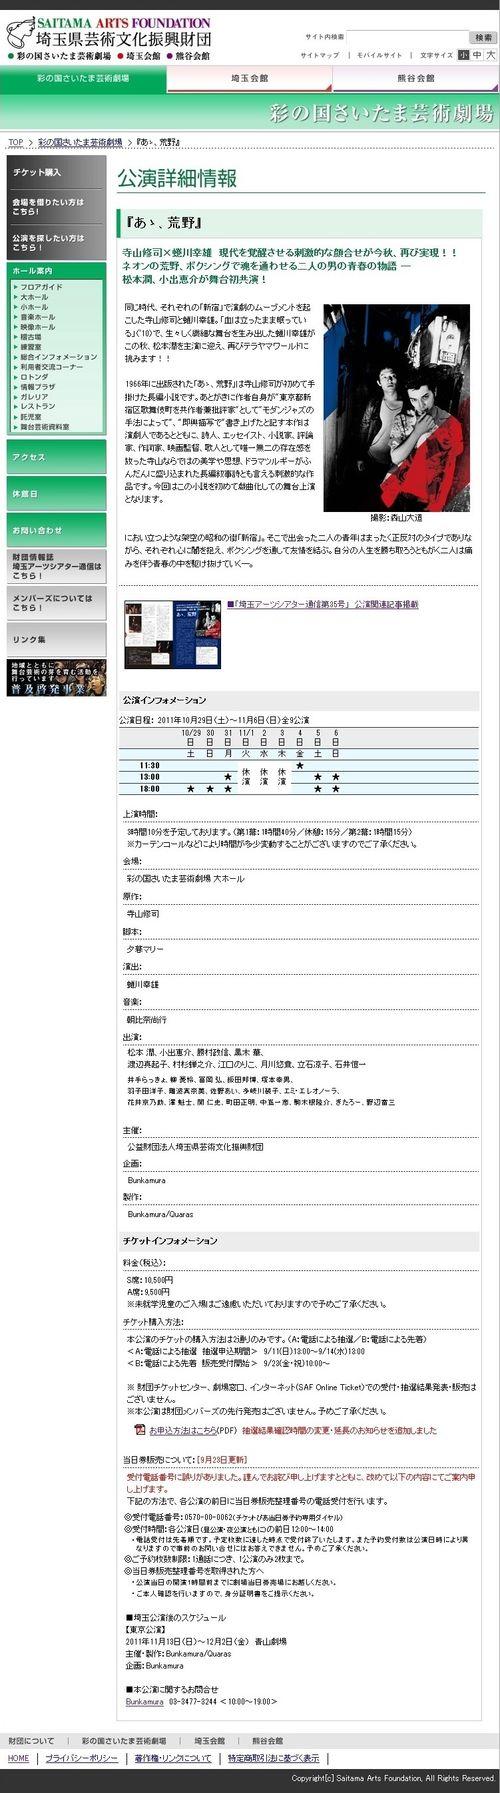 2011.10.29 au 2010.11.06 あゝ, 荒野 Ah, Wilderness Saitama Art Fondation 01